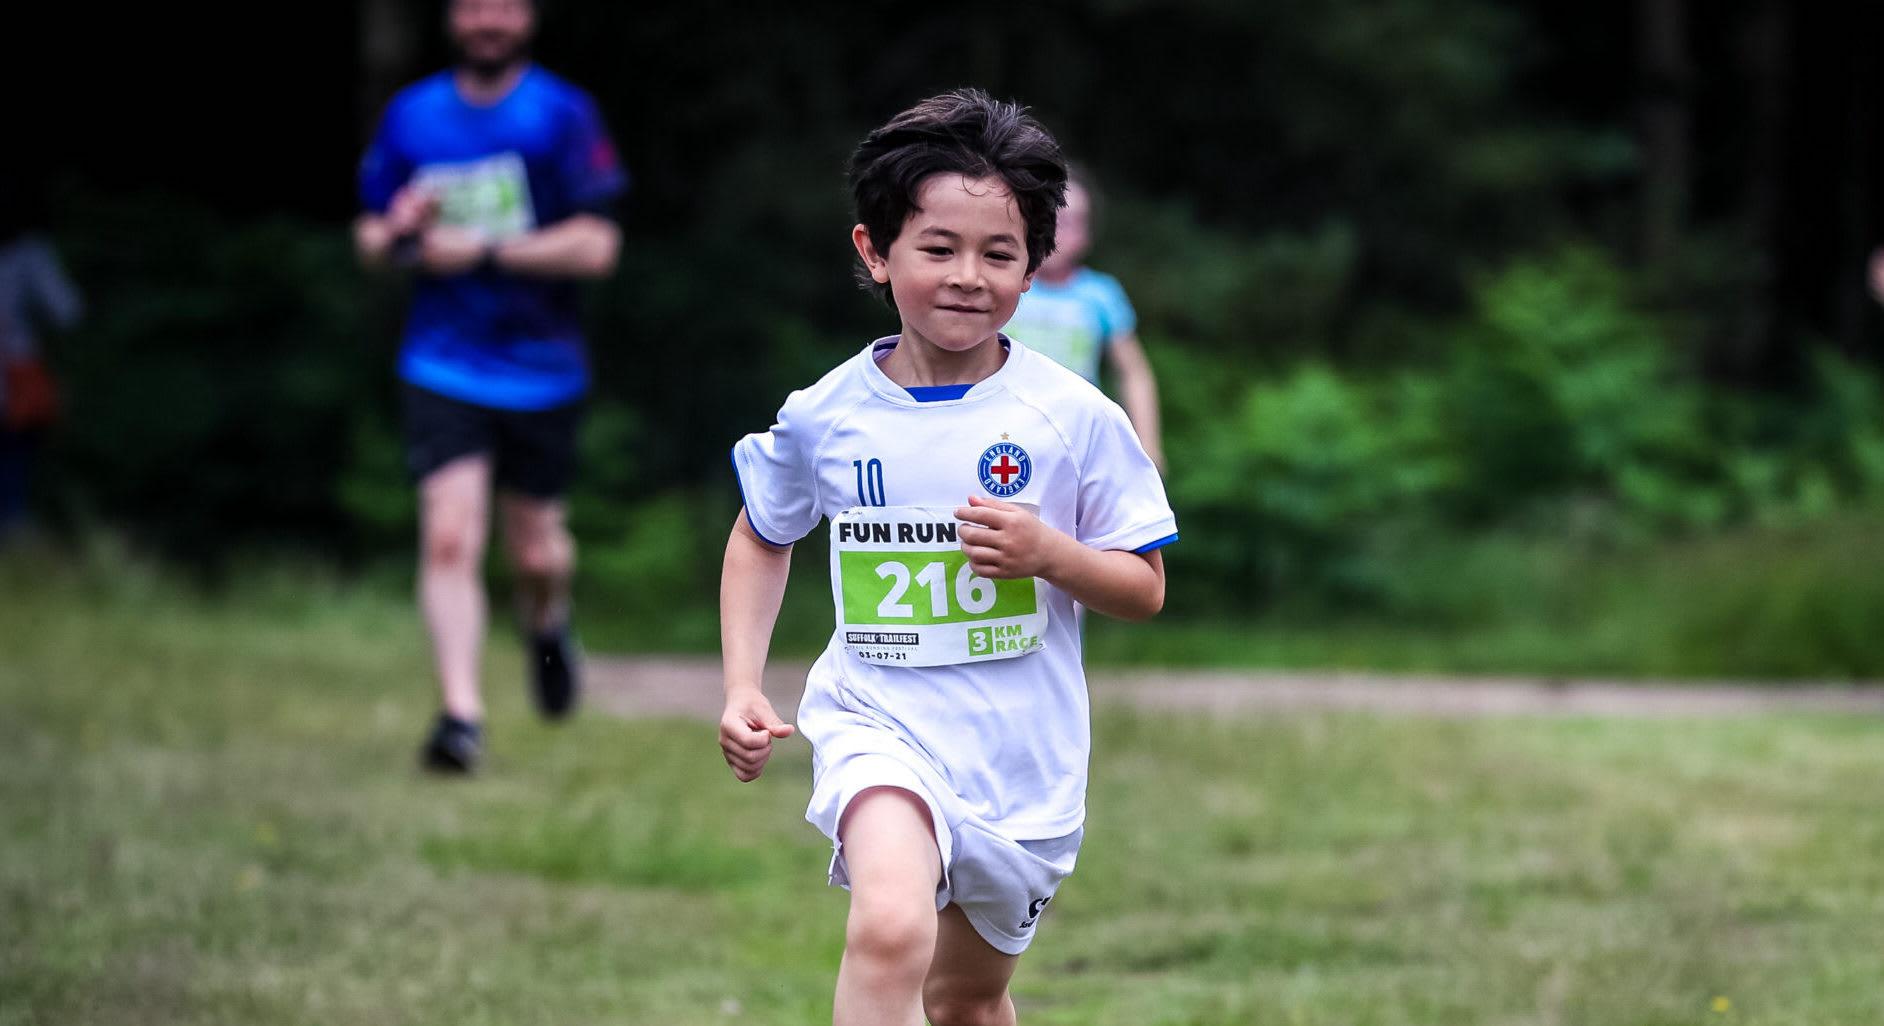 Suffolk Trail Running Festival